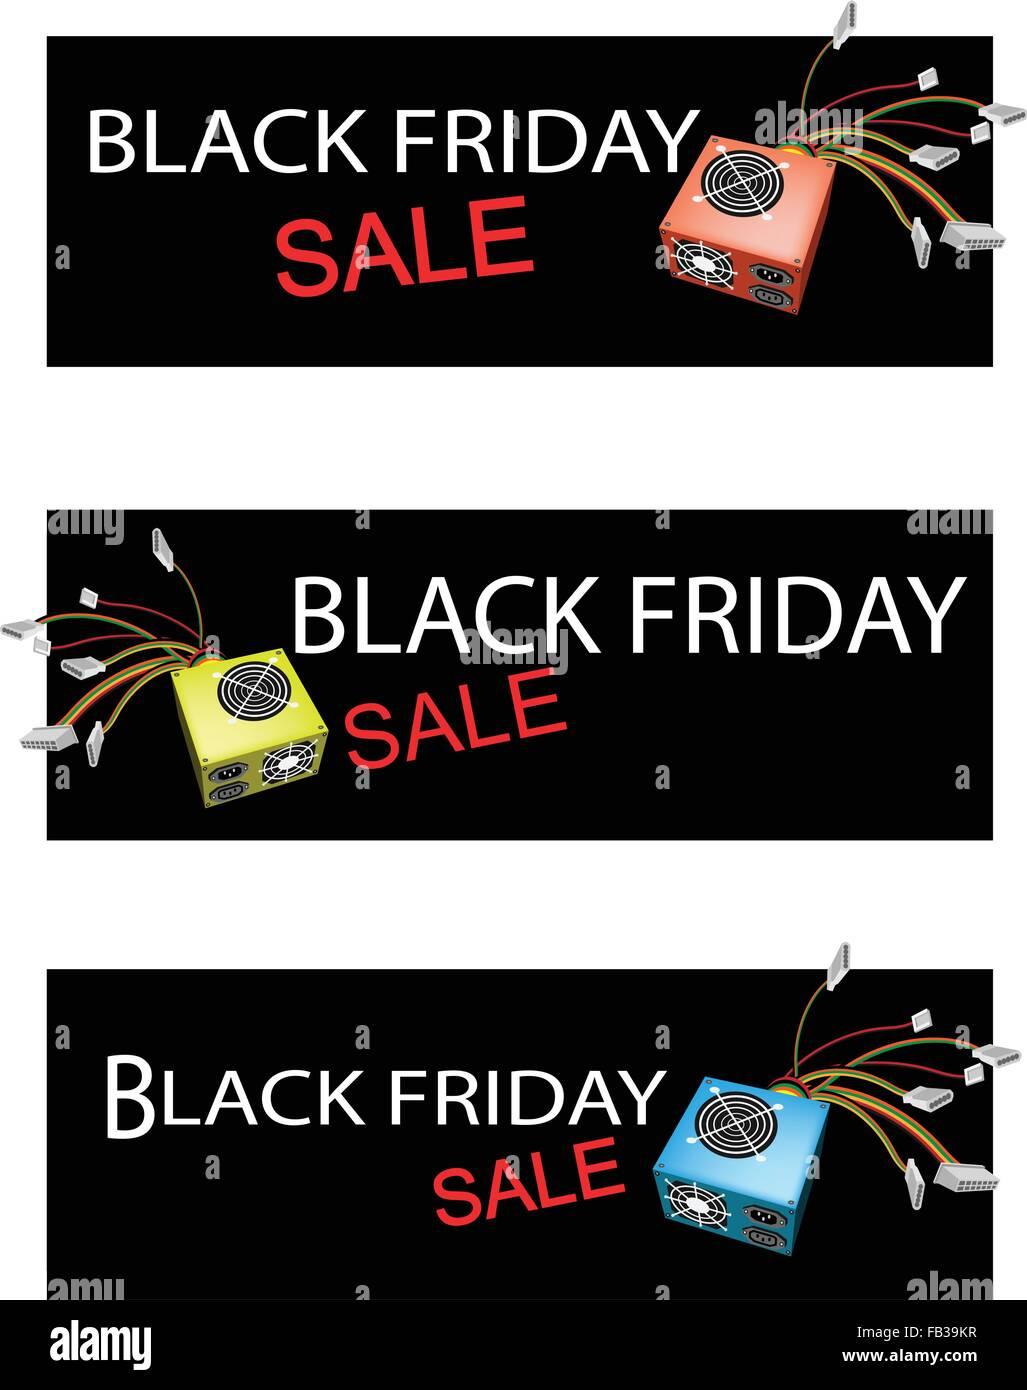 Illustration of Computer Power Supply Box on Black Friday Shopping ...